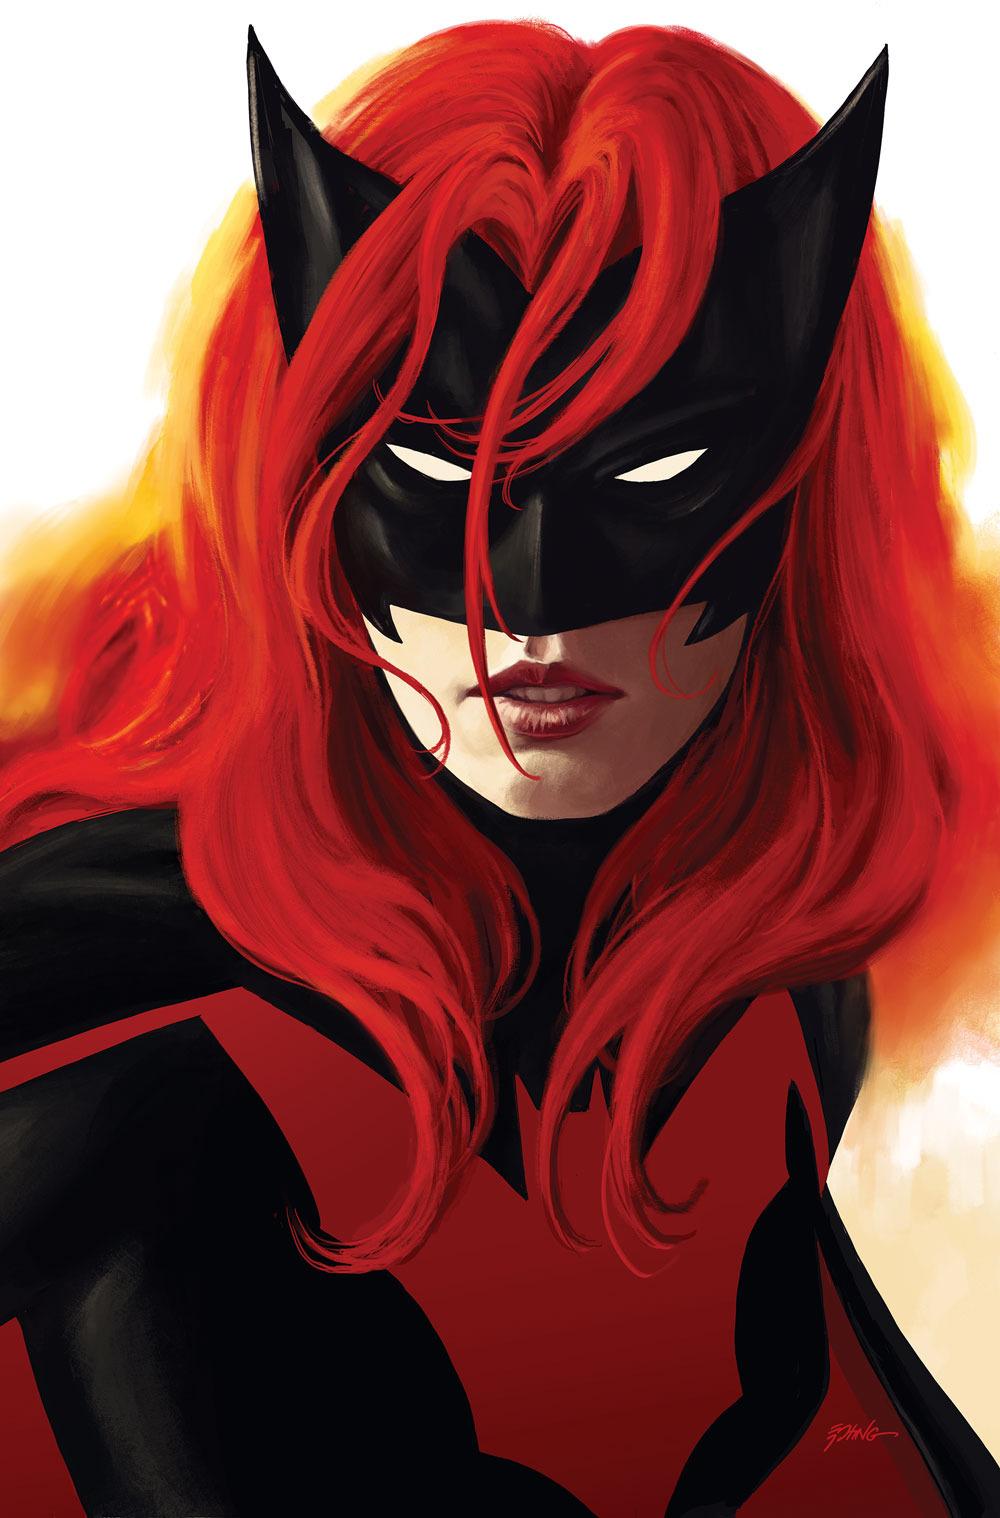 Batwoman: Rebirth #1 by Steve Epting